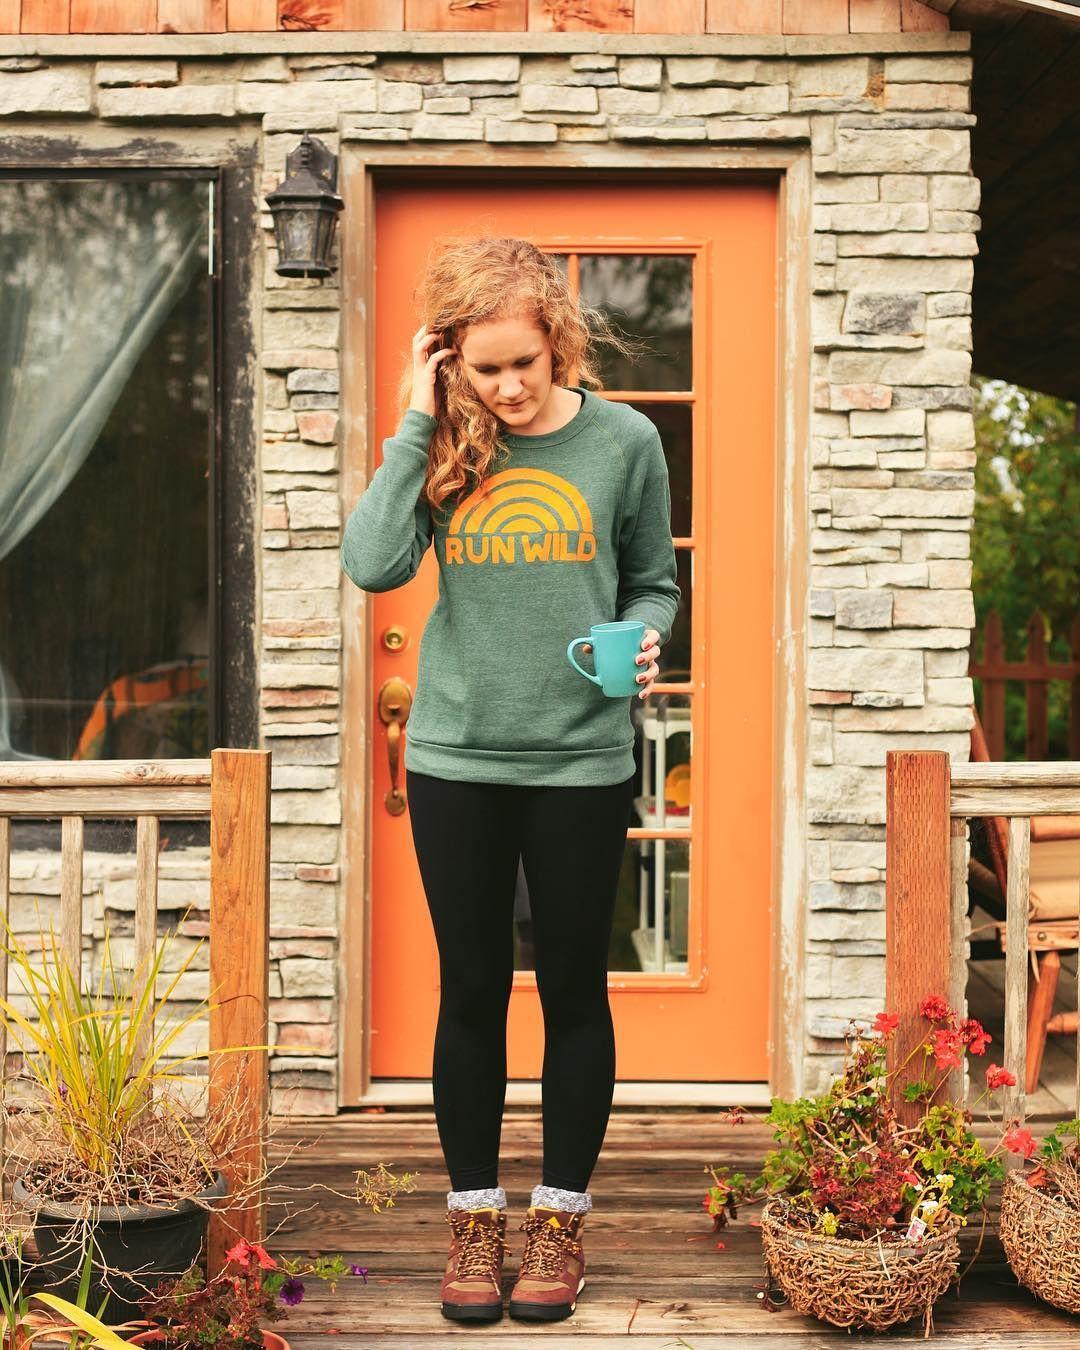 83bf50905 cabin mornings in our 'run wild' sweatshirt @charityvictoria @alaskangeles  @indybrandclothing